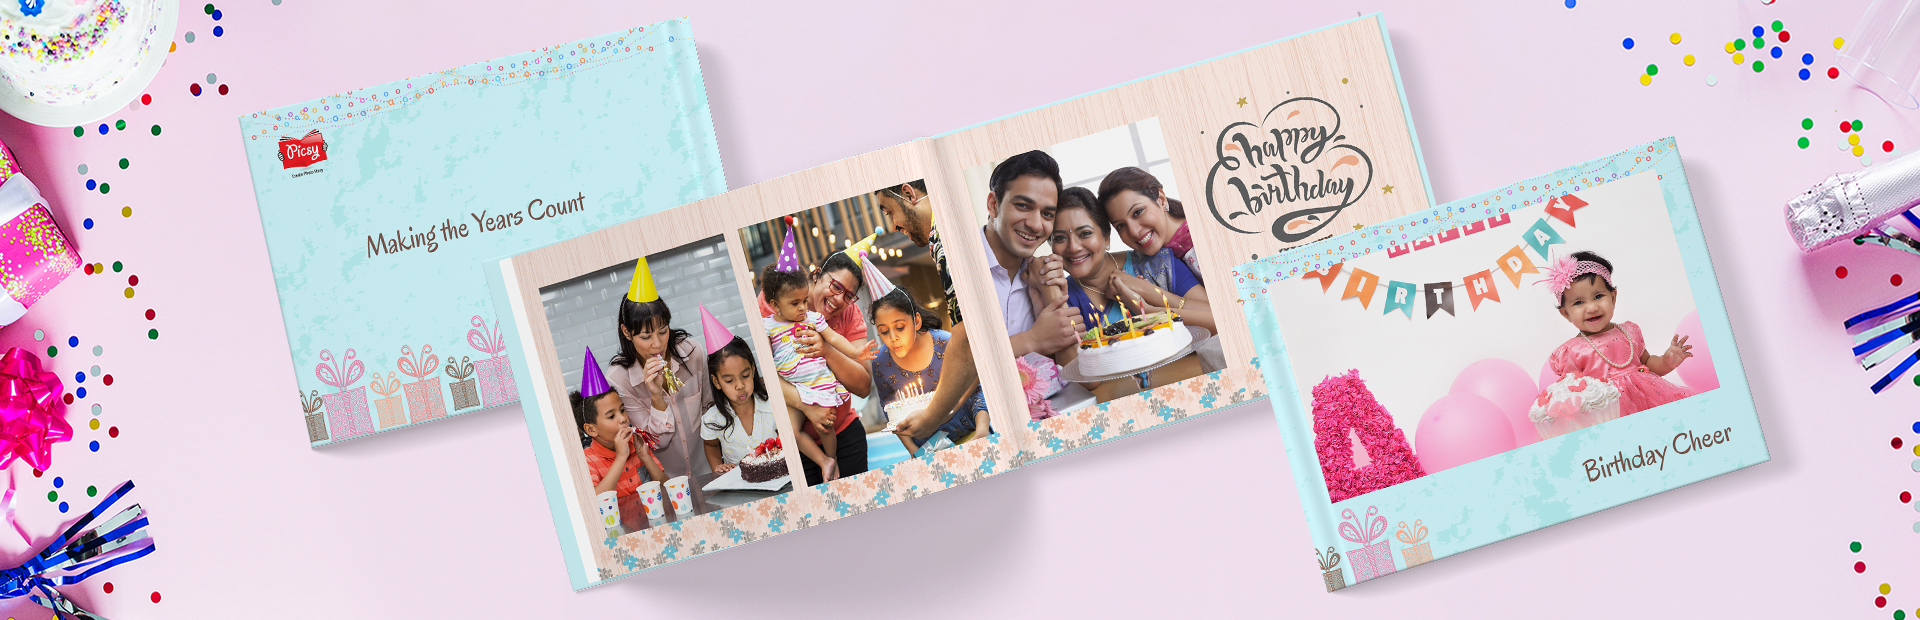 Smiley Birthday Custom Photo Books